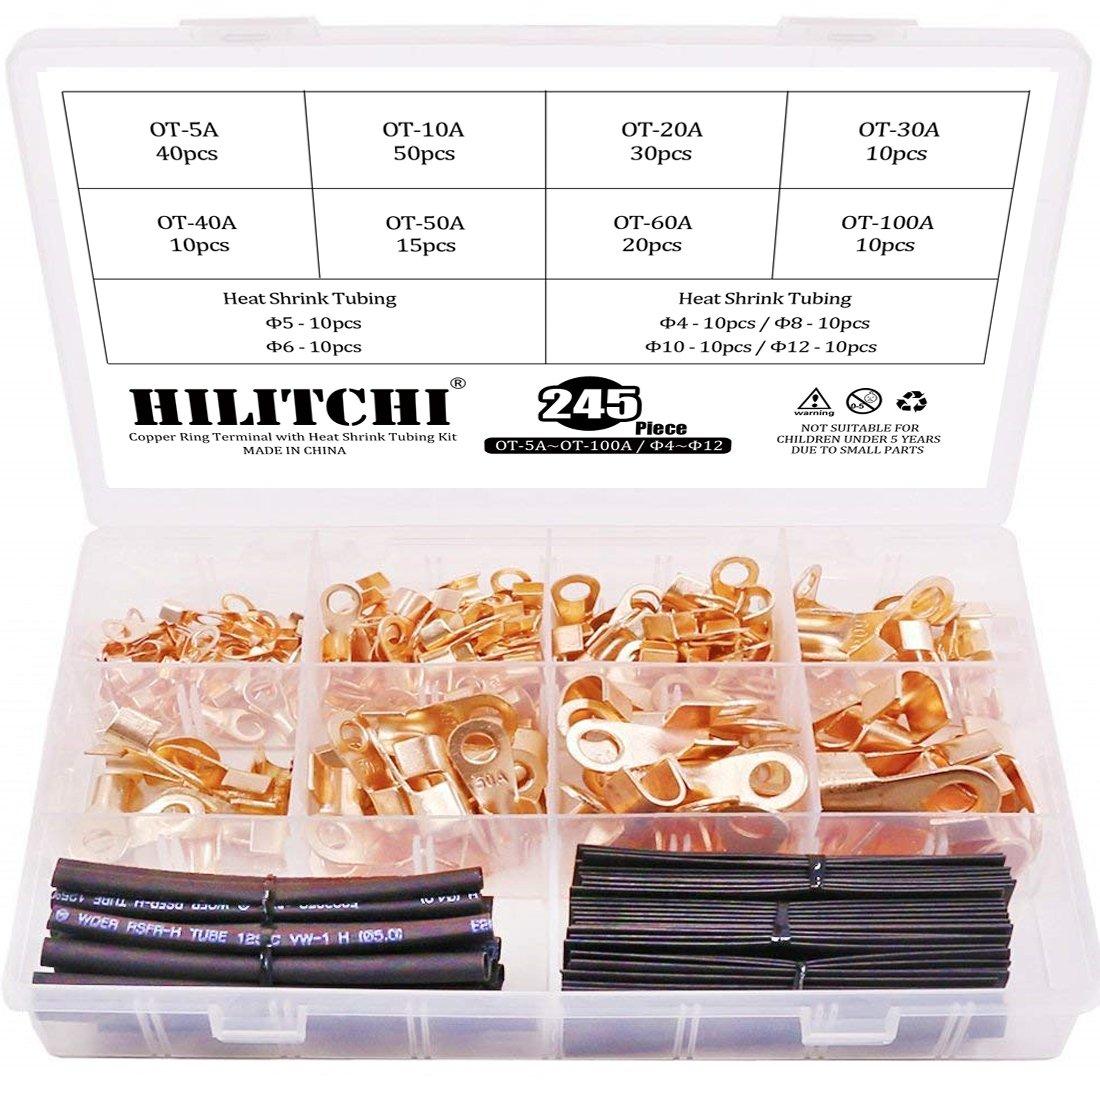 Hilitchi 245-Pcs Open Barrel Wire Crimp Copper Ring Lugs Terminal Connector with 2:1 Heat Shrink Tubing Assortment Kit - OT 5A 10A 20A 30A 40A 50A 60A 100A